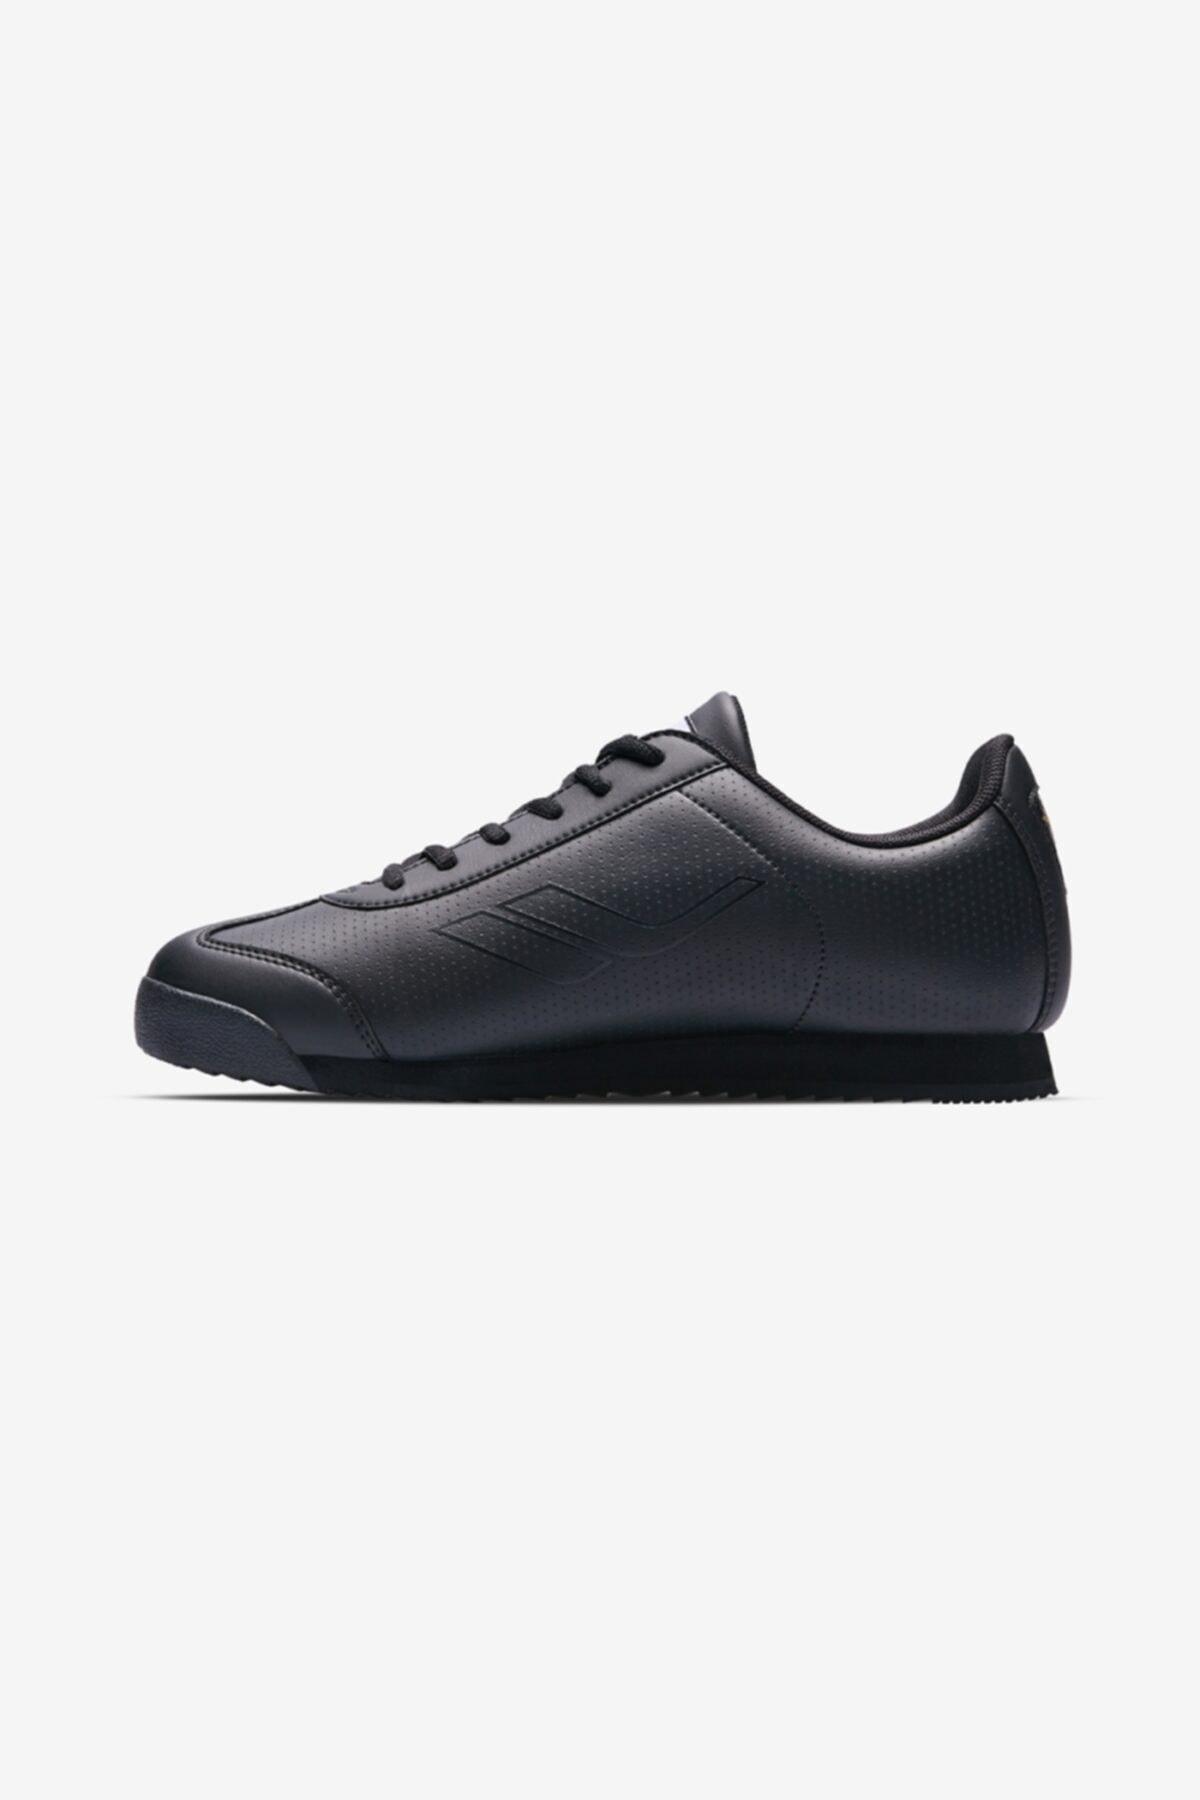 Lescon Winner Bayan Sneaker Ayakkabı Siyah 2